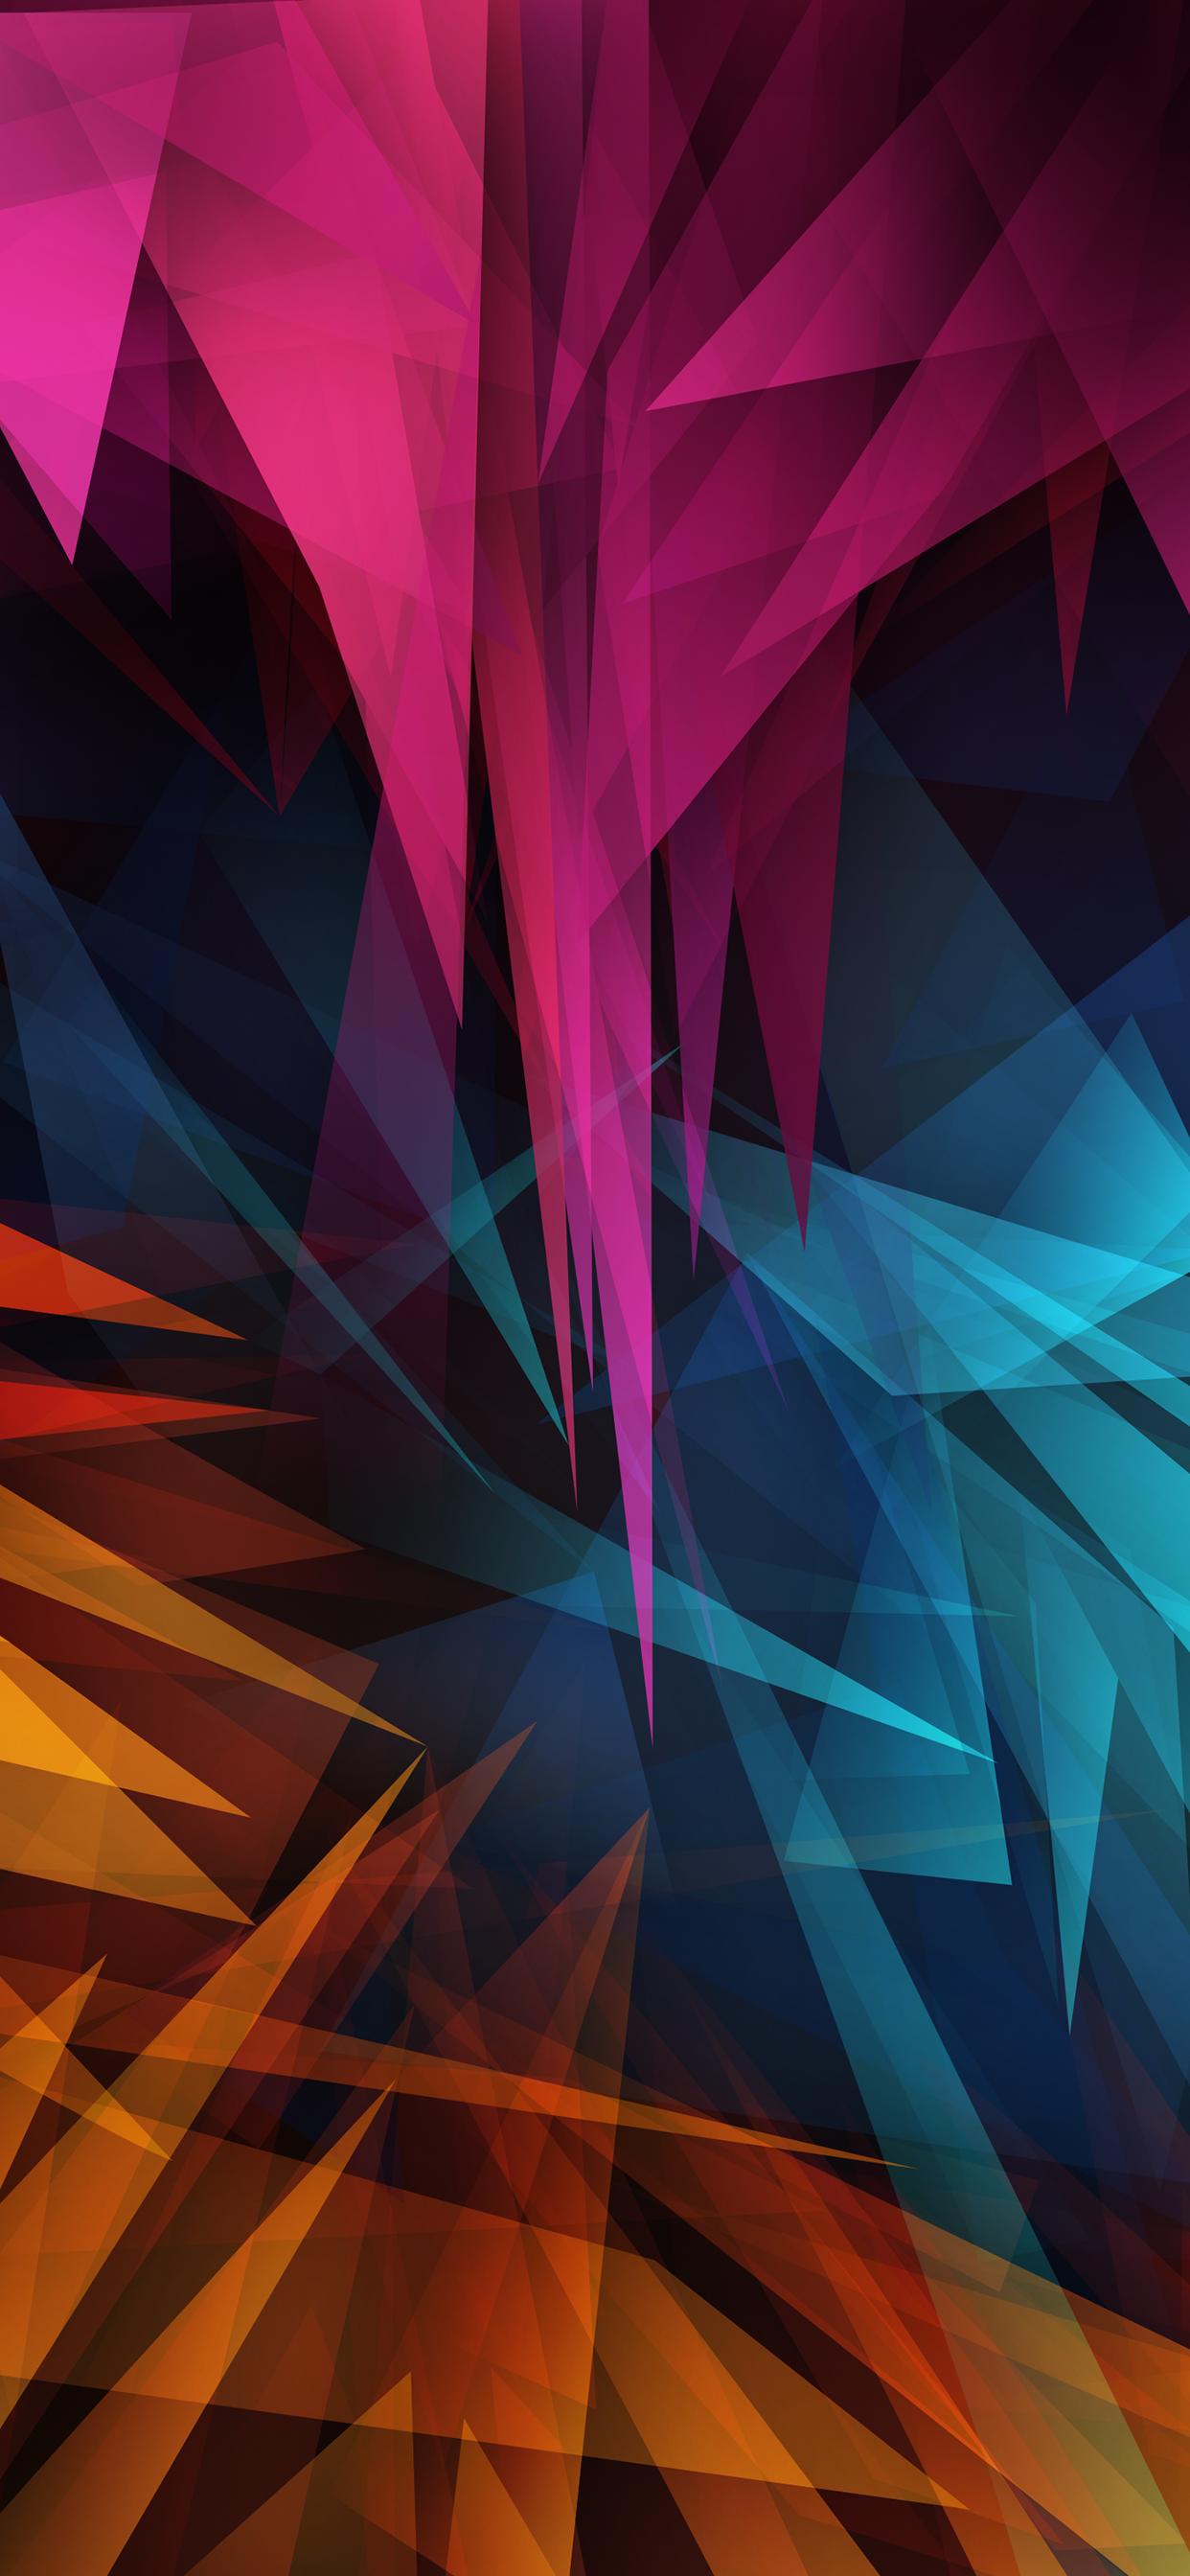 4k iPhone 11 Pro Wallpapers - Wallpaper Cave